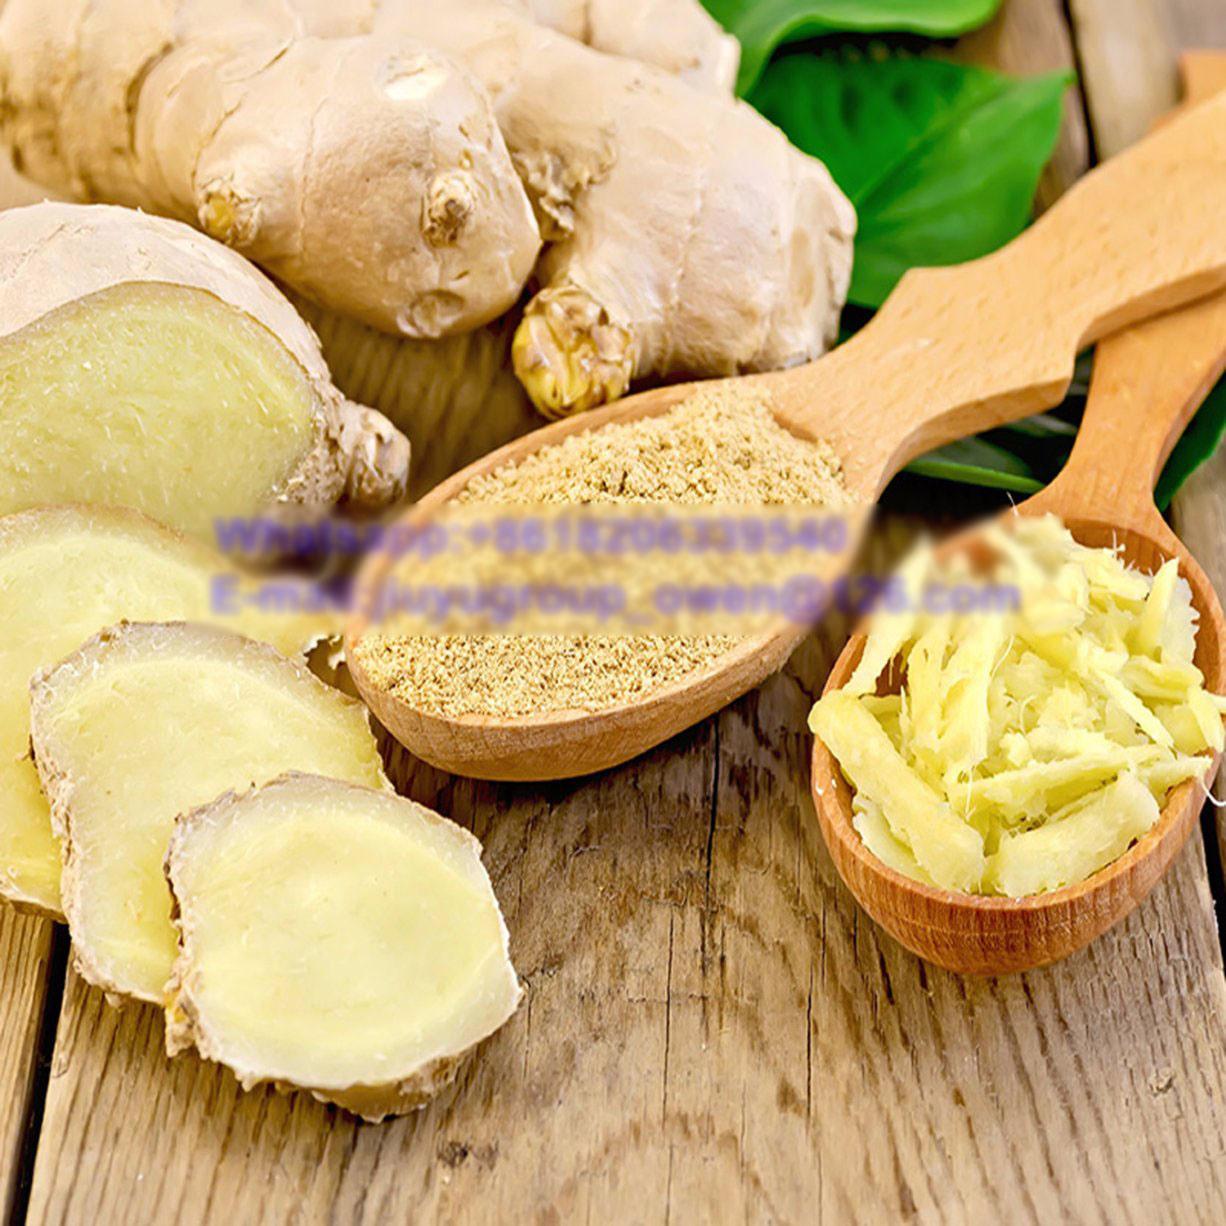 Chinese Fresh Vegetable Air Dry Ginger